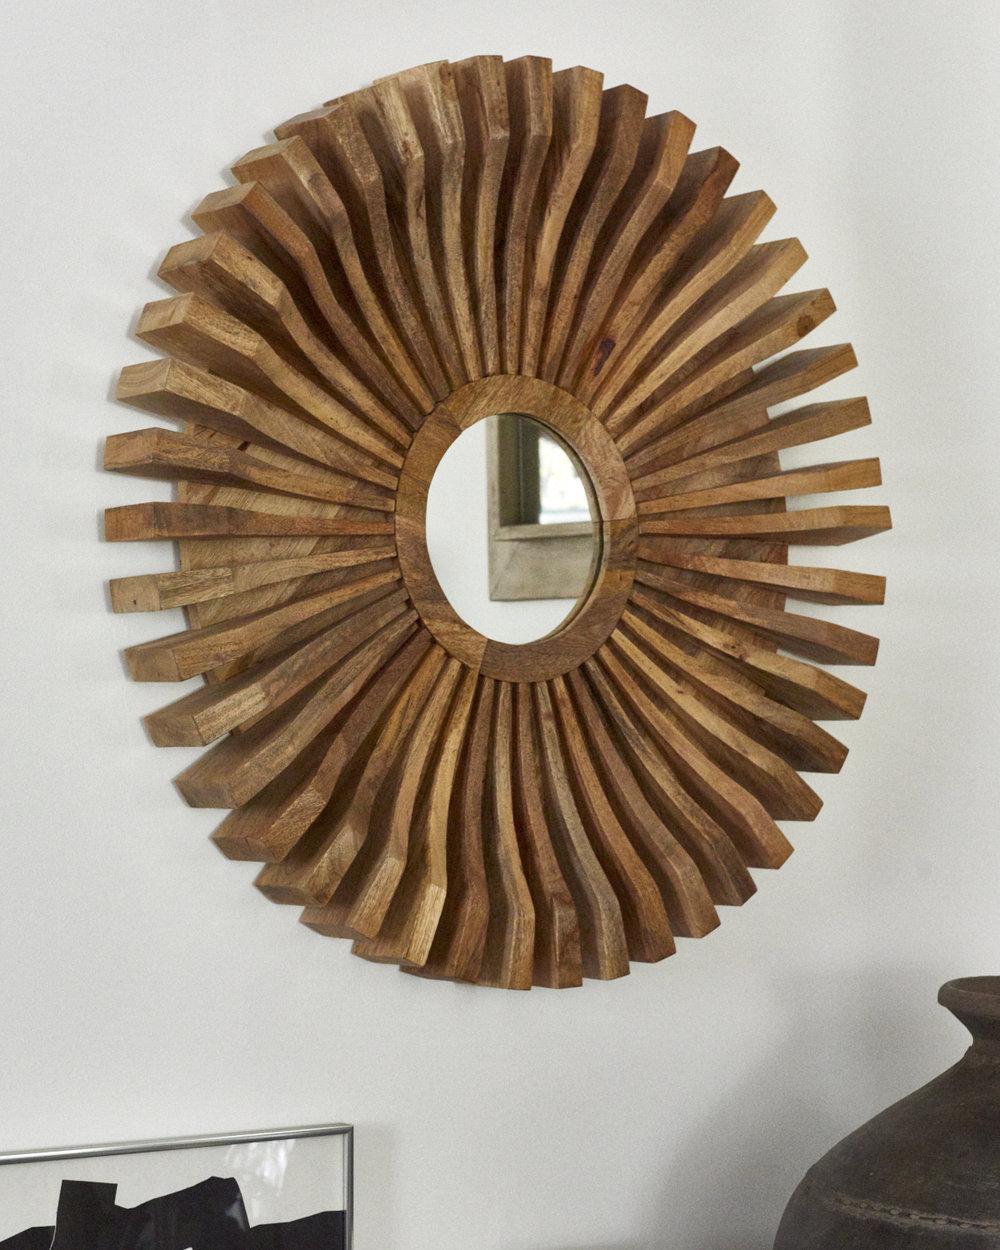 Wooden mid-century starburst mirror, $1800